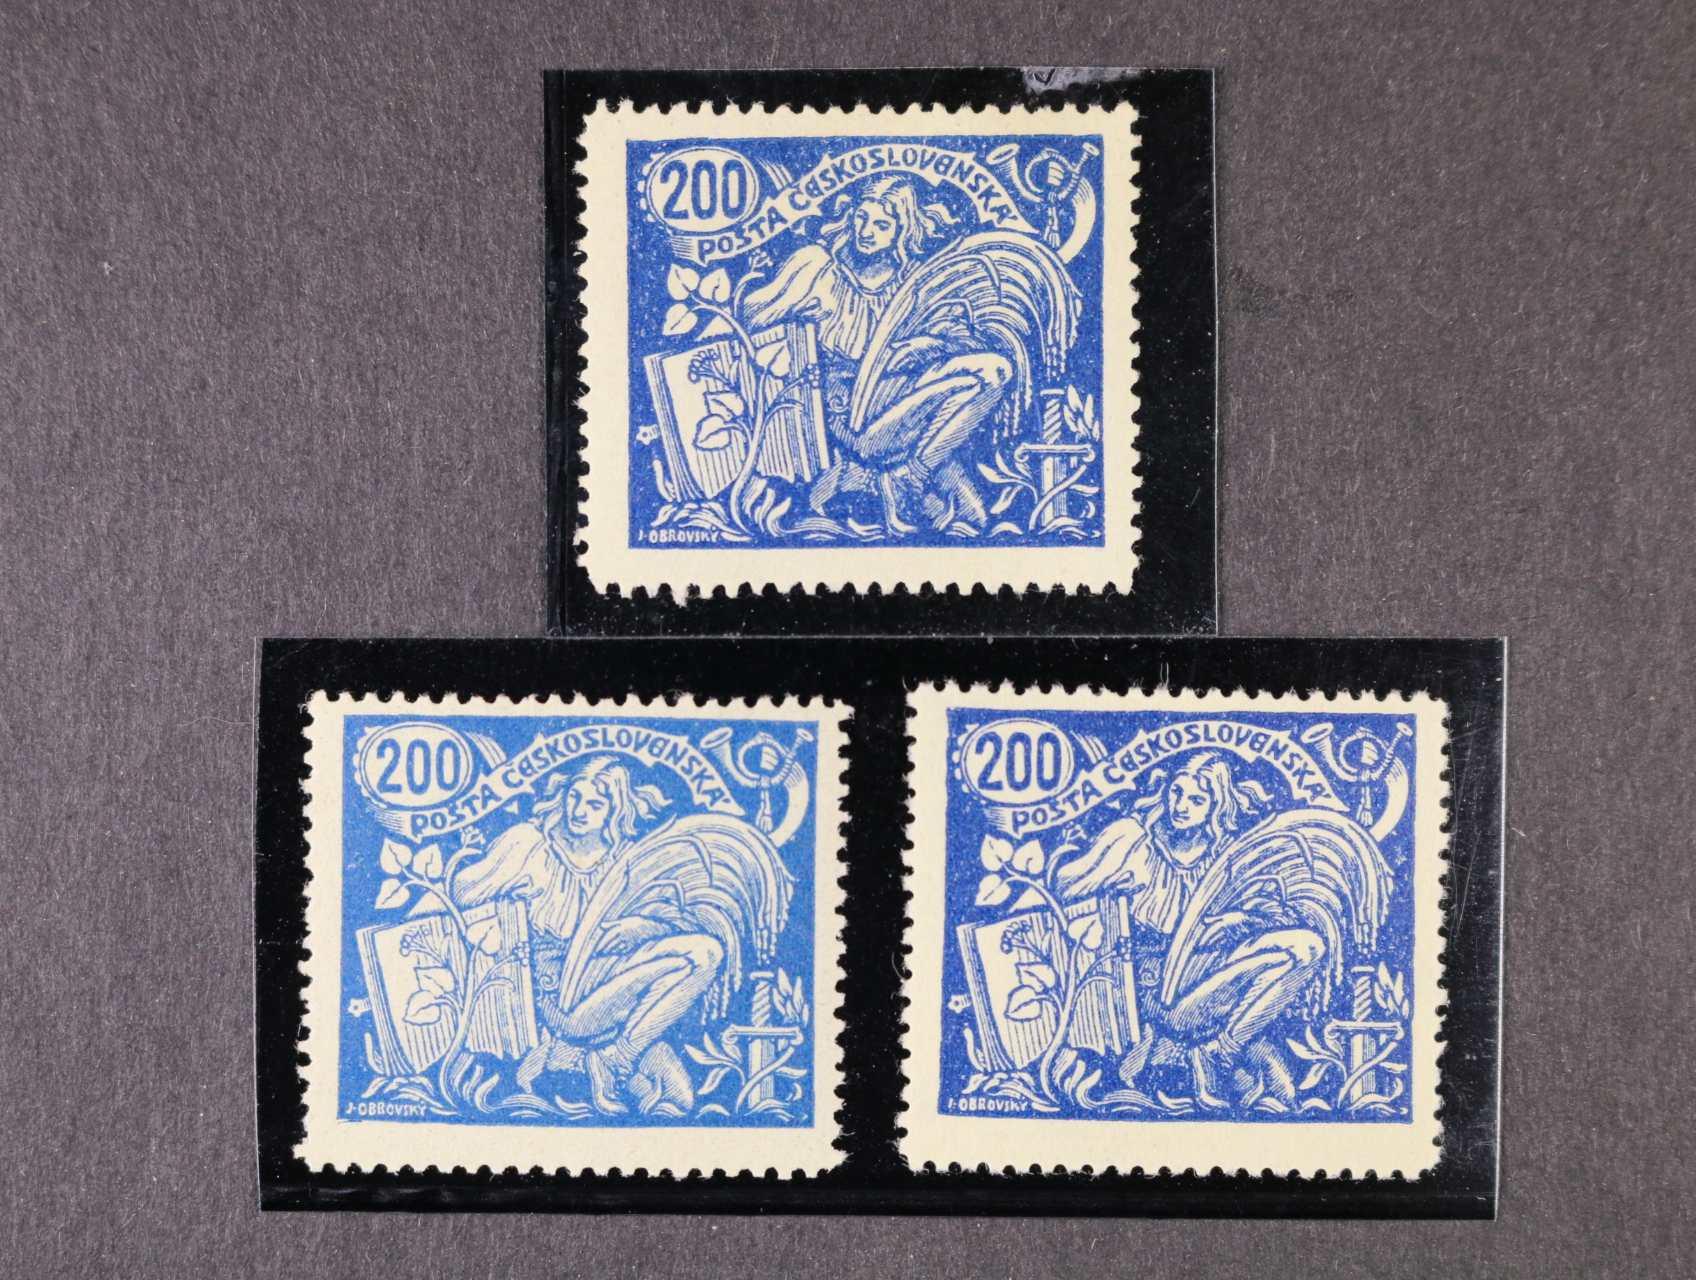 zn. č. 174 A, typ II + typ III + typ III s tzv. bodákem, zk. Karásek, kat. cena 1150 Kč